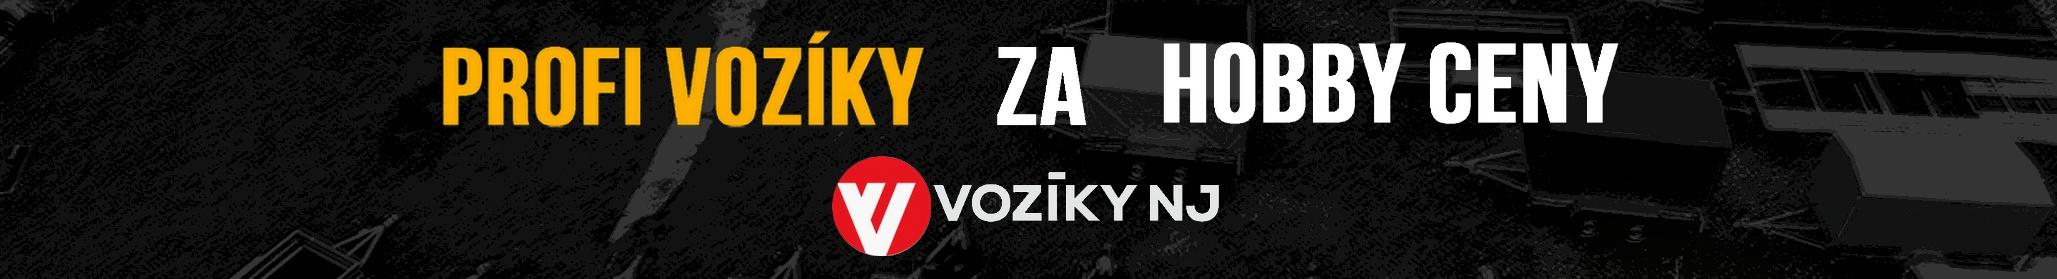 Profi vozíky za hobby ceny: Vozíky NJ.cz